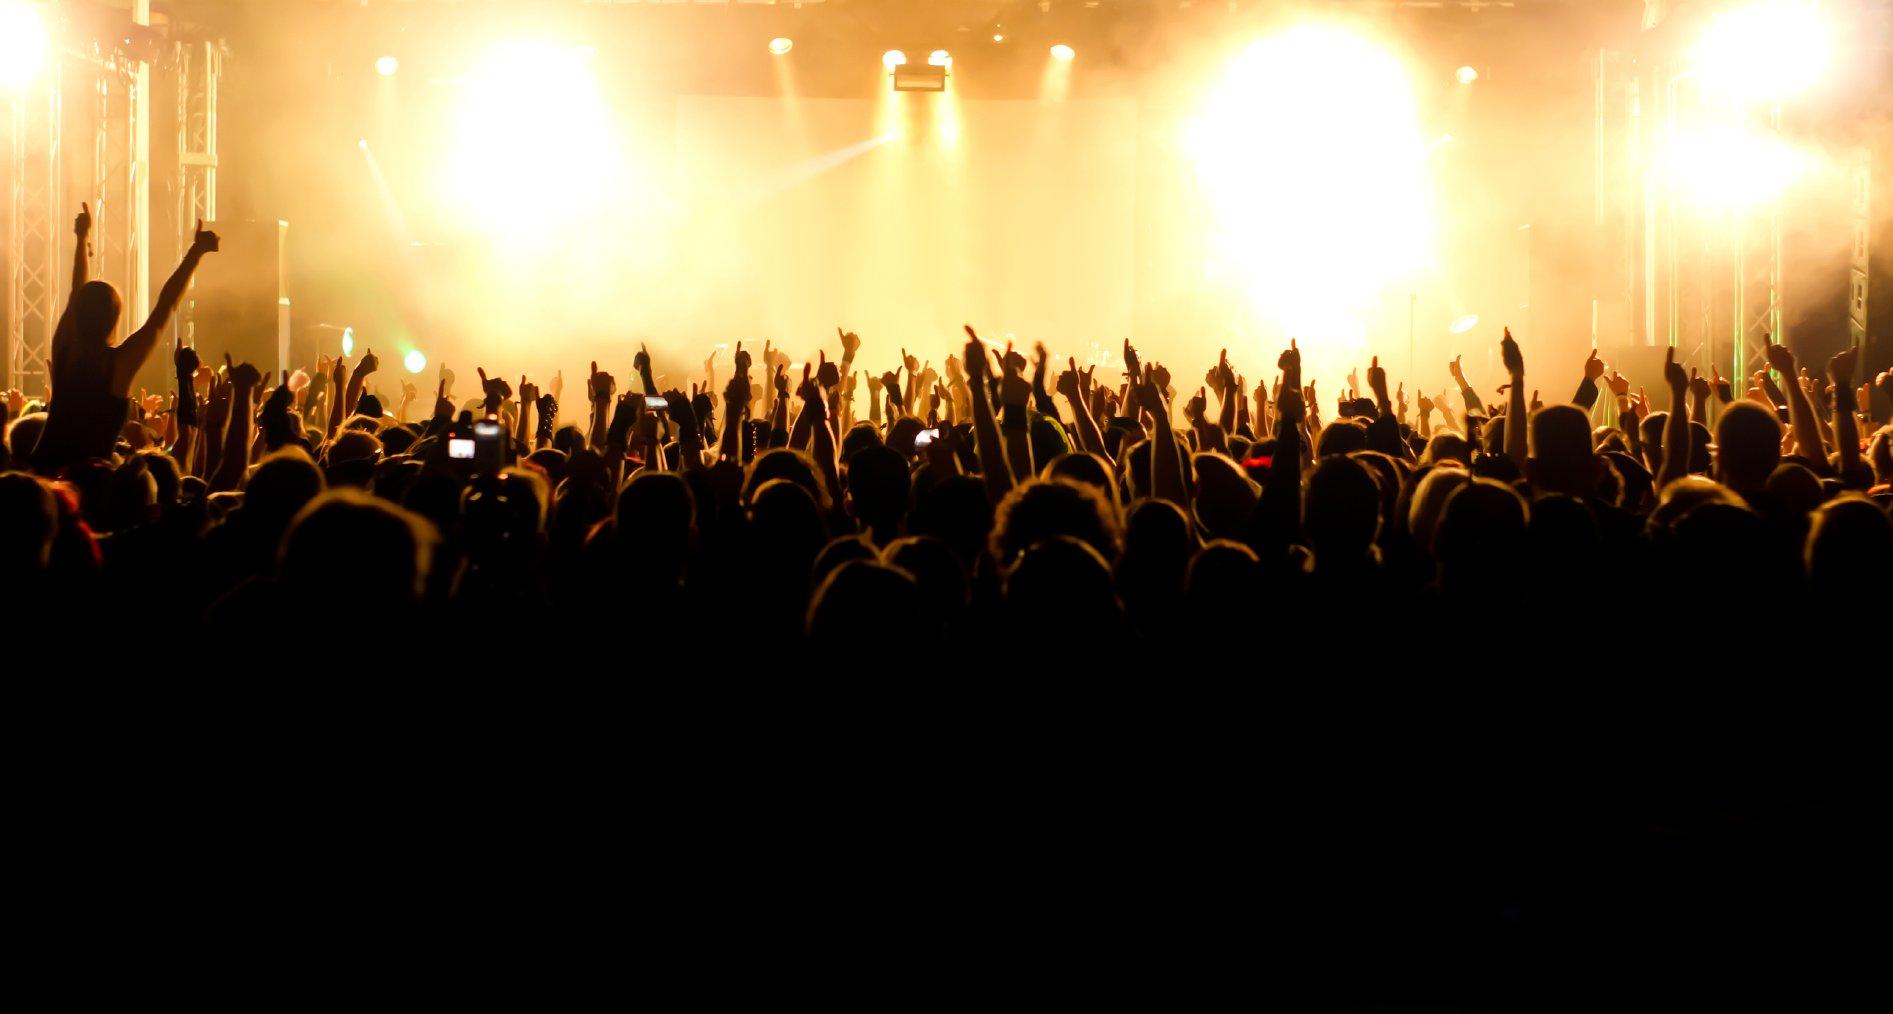 rock concert crowd wallpaper wwwimgkidcom the image